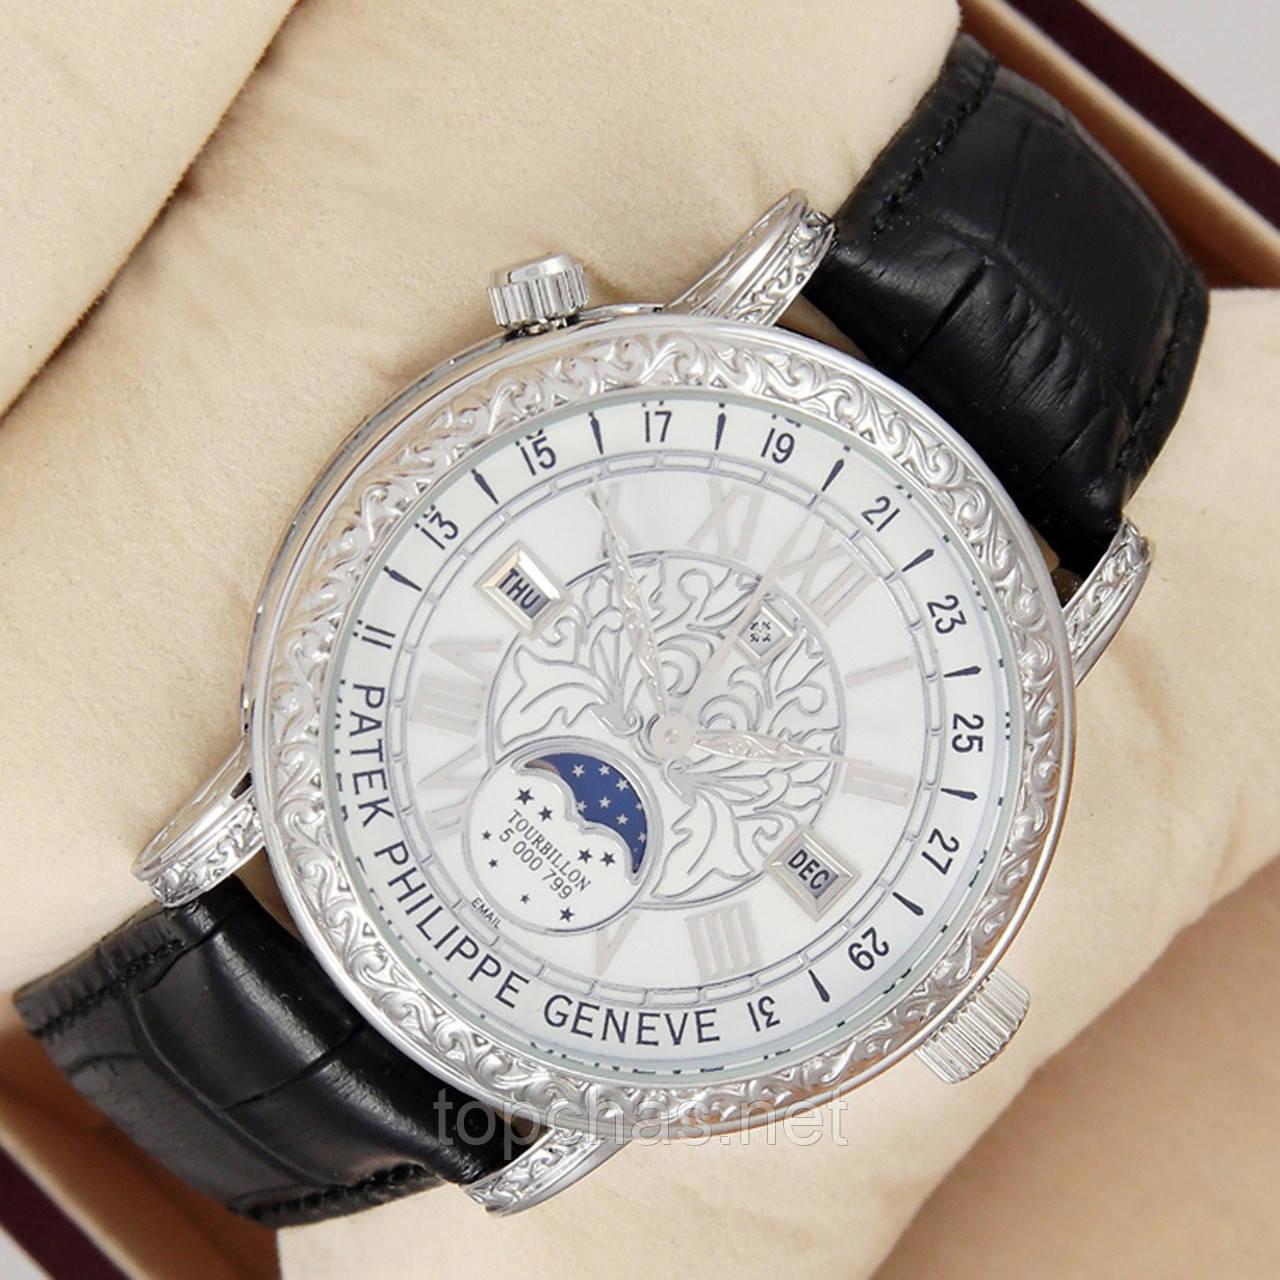 77021339 Мужские кварцевые наручные часы Patek Philippe Grand Complications Sky Moon  Tourbillon на кожаном ремешке - Top